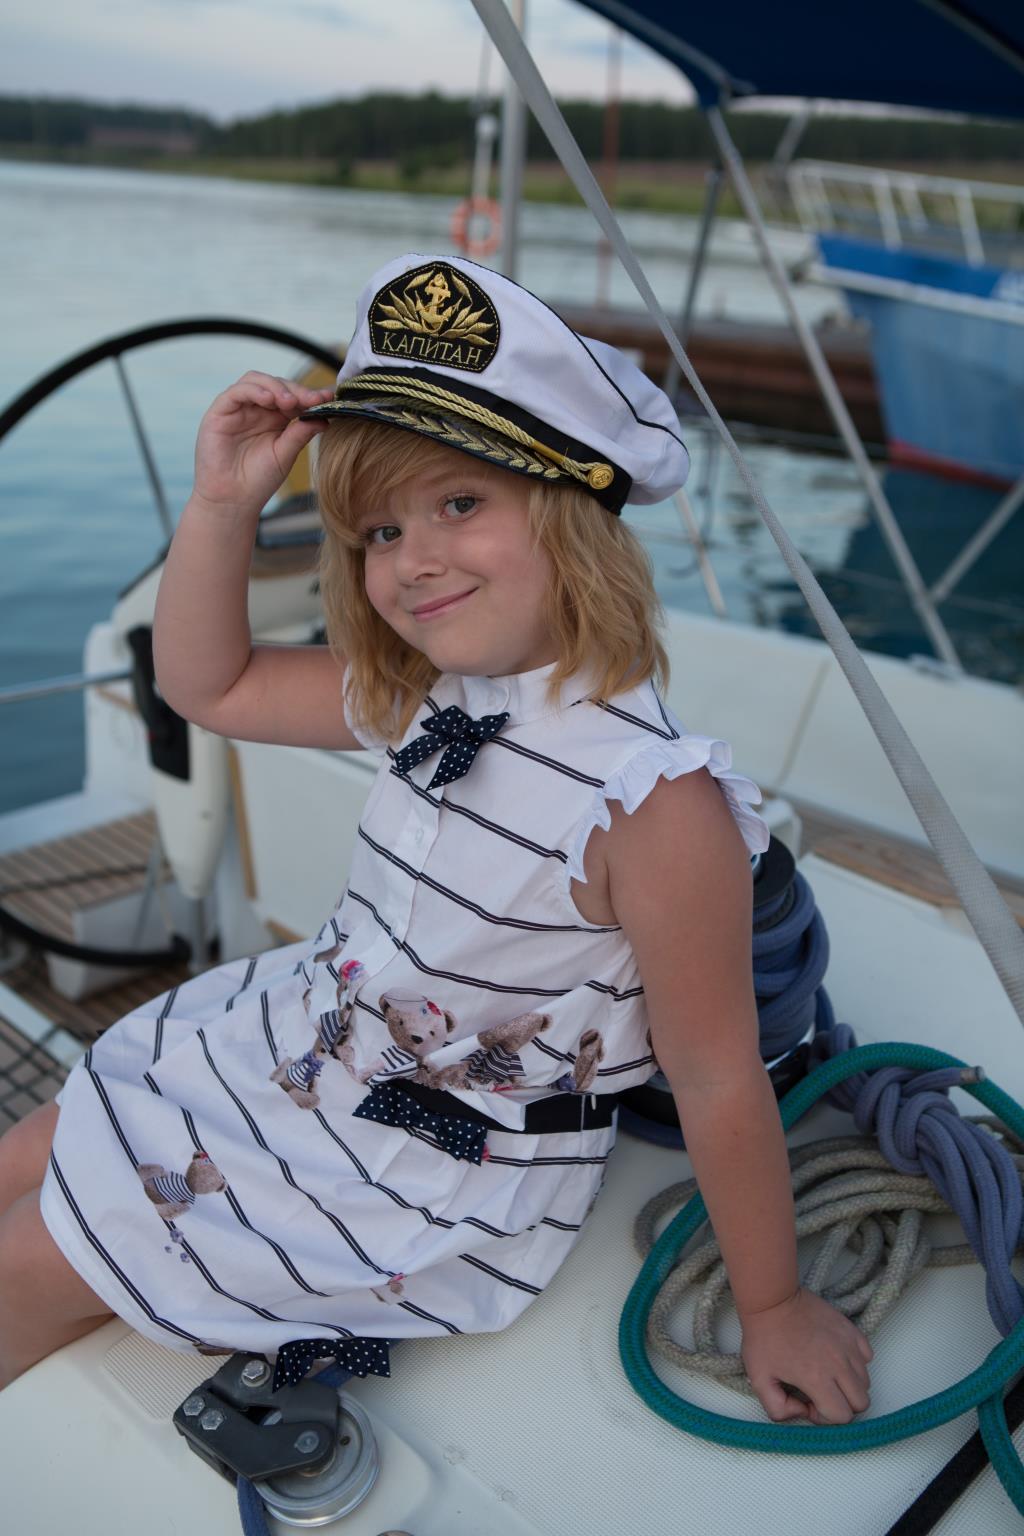 Моя улыбка - это флаг корабля!. Лапочка